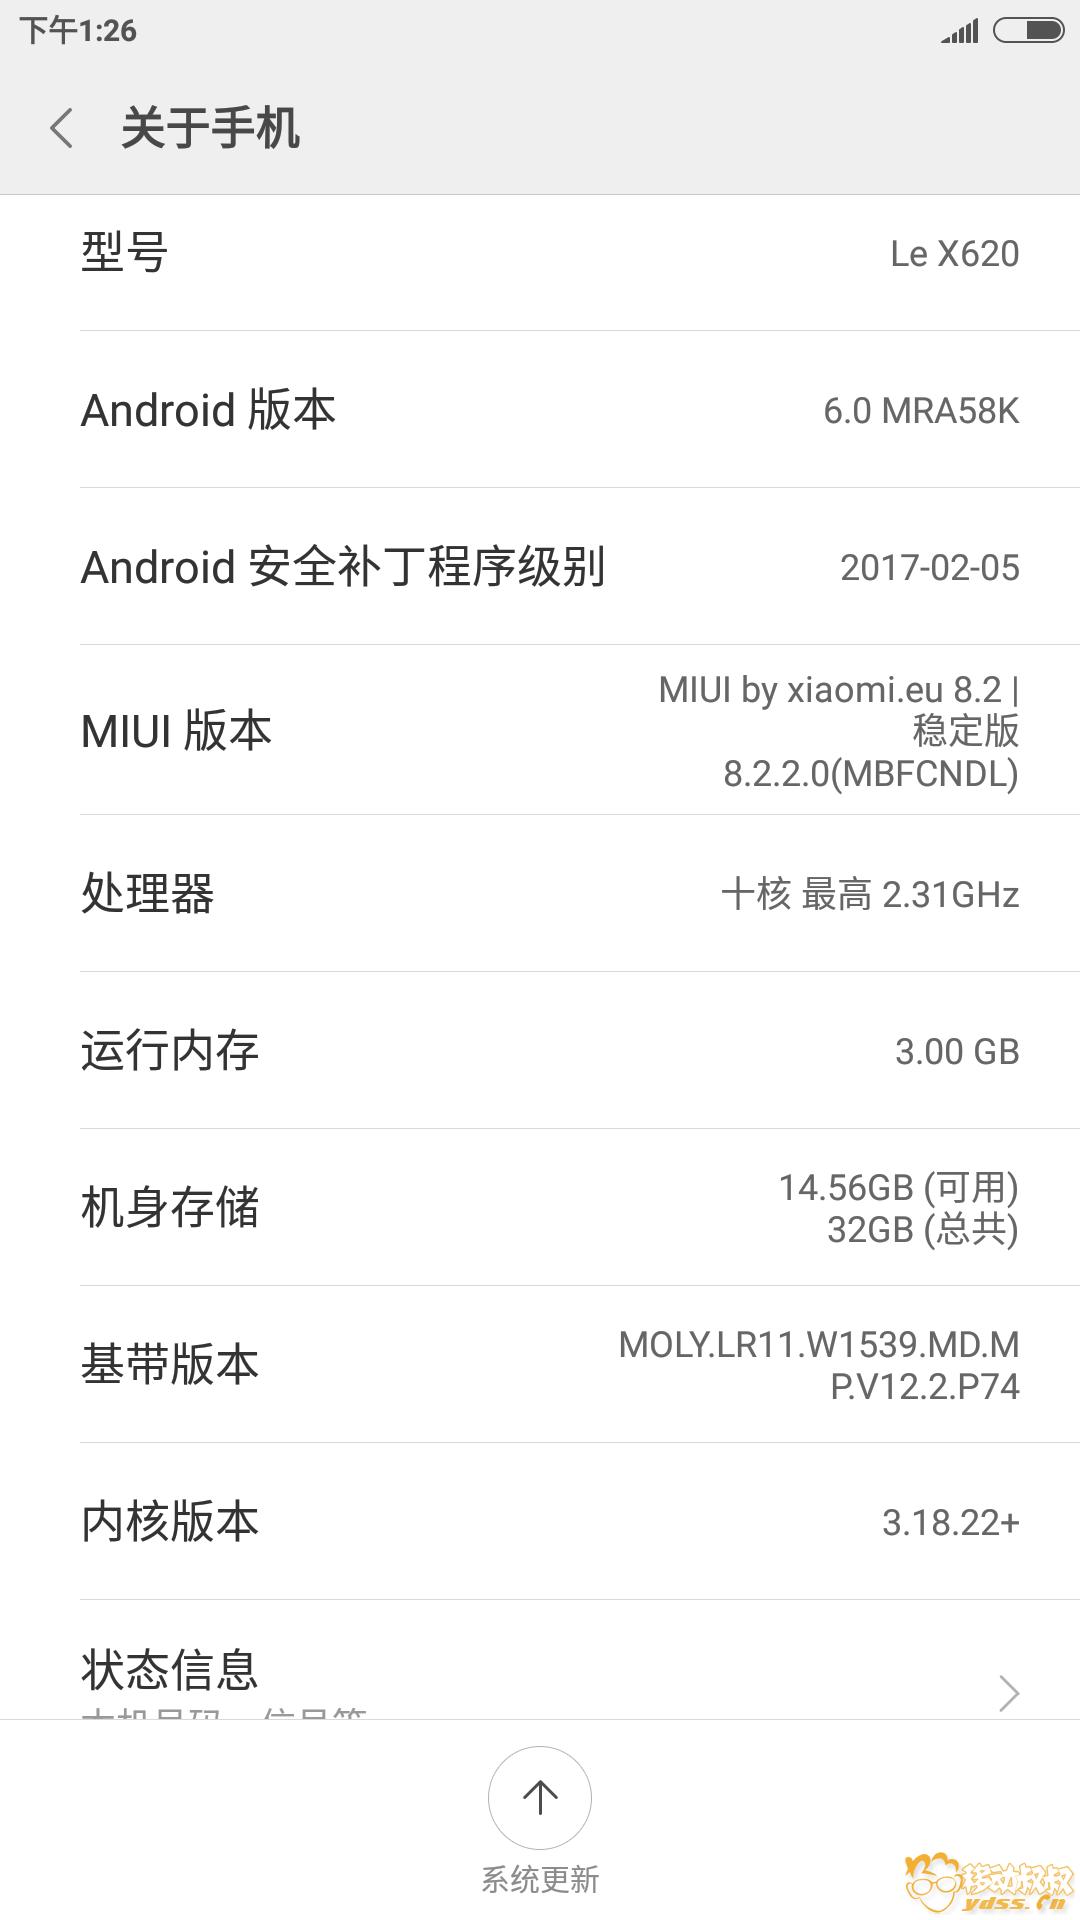 Screenshot_2017-08-12-13-26-58-562_com.android.settings.png